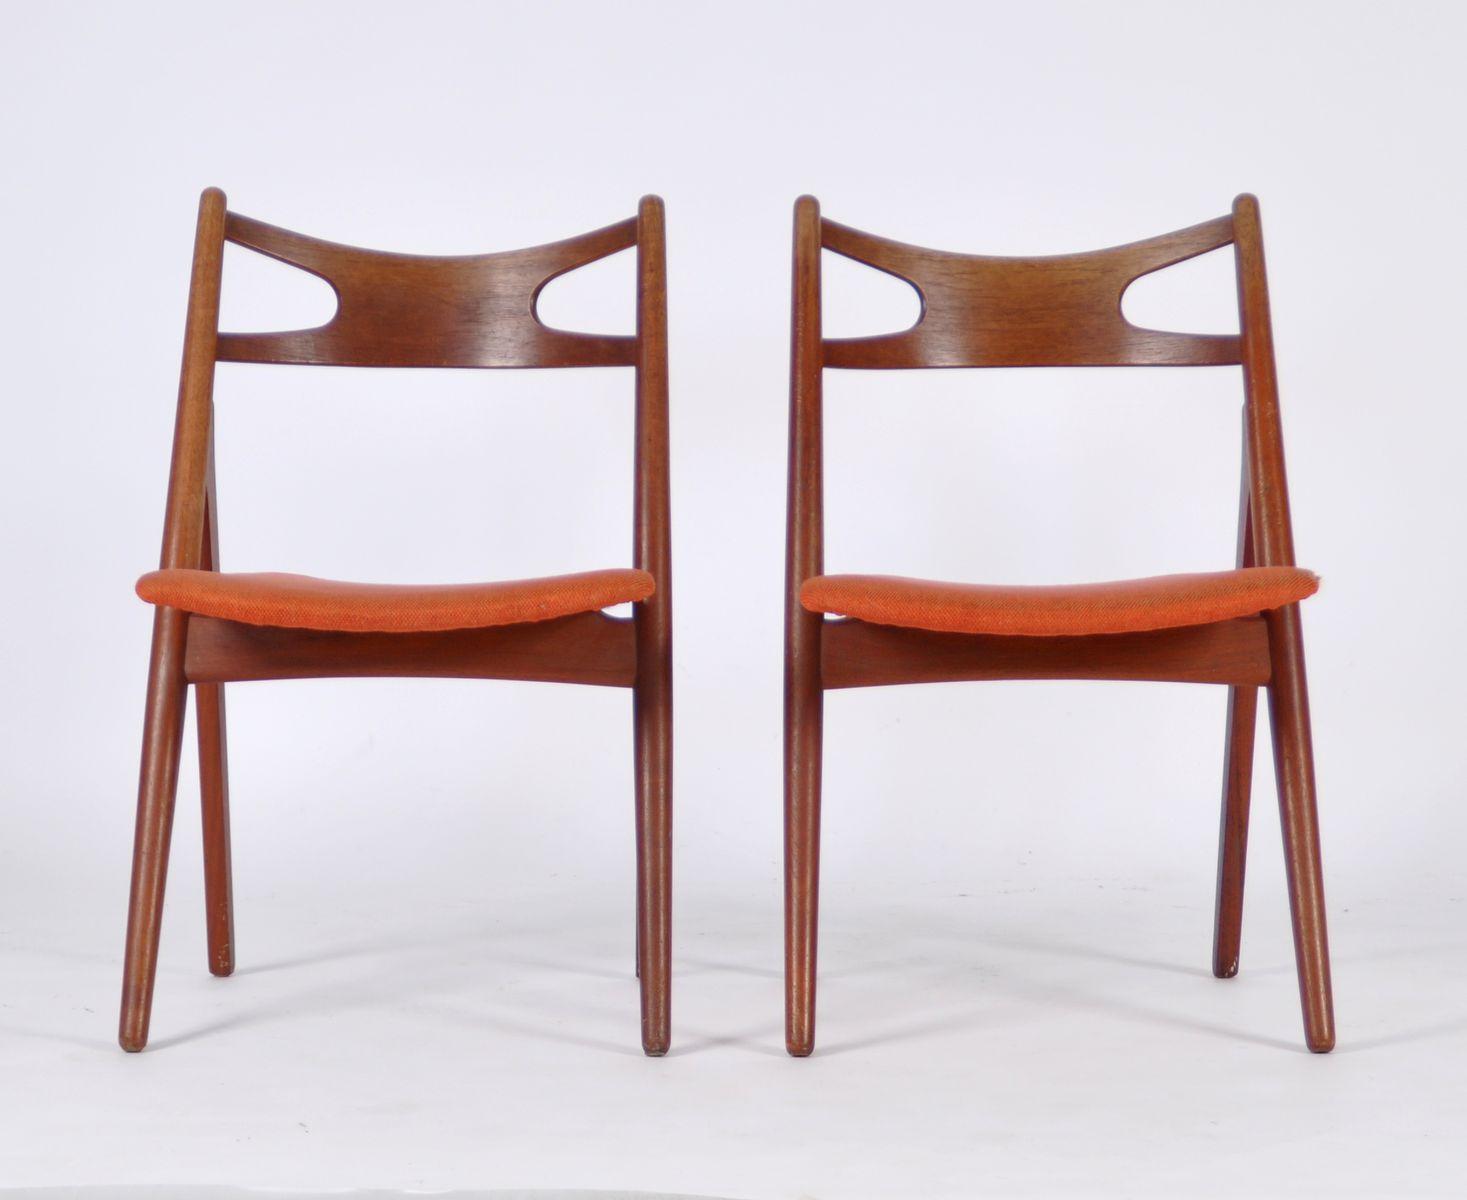 modell ch29 st hle von hans j wegner f r carl hansen s n 1950er 2er set bei pamono kaufen. Black Bedroom Furniture Sets. Home Design Ideas